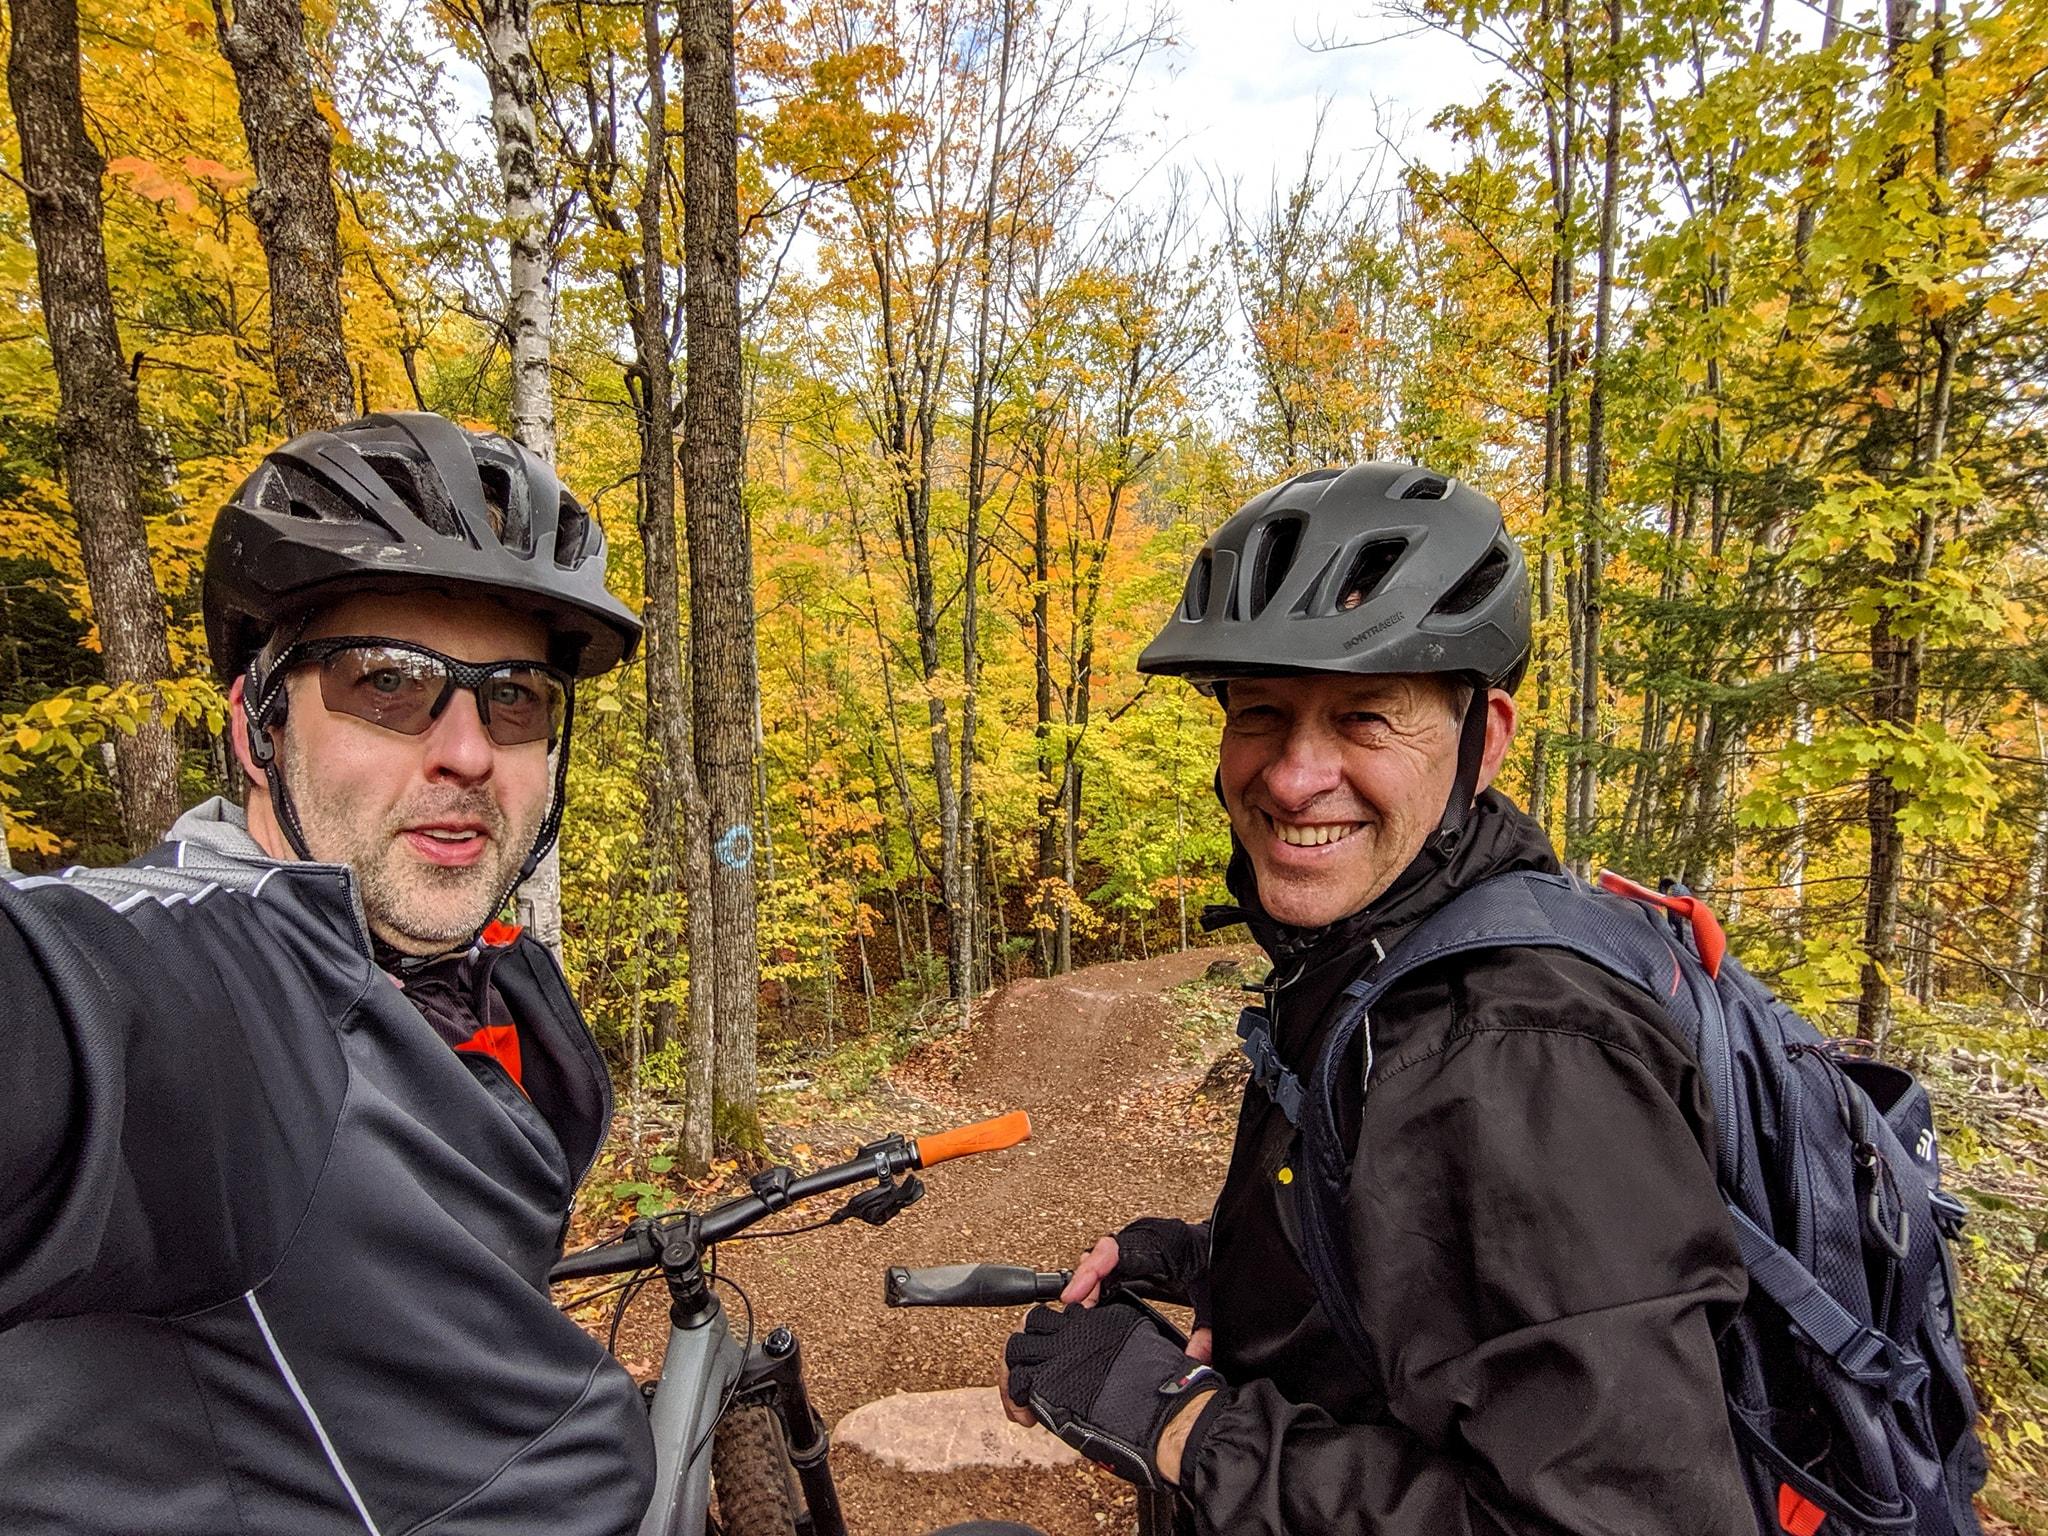 Two men biking at Tioga Recreation Area in Grand Rapids in fall